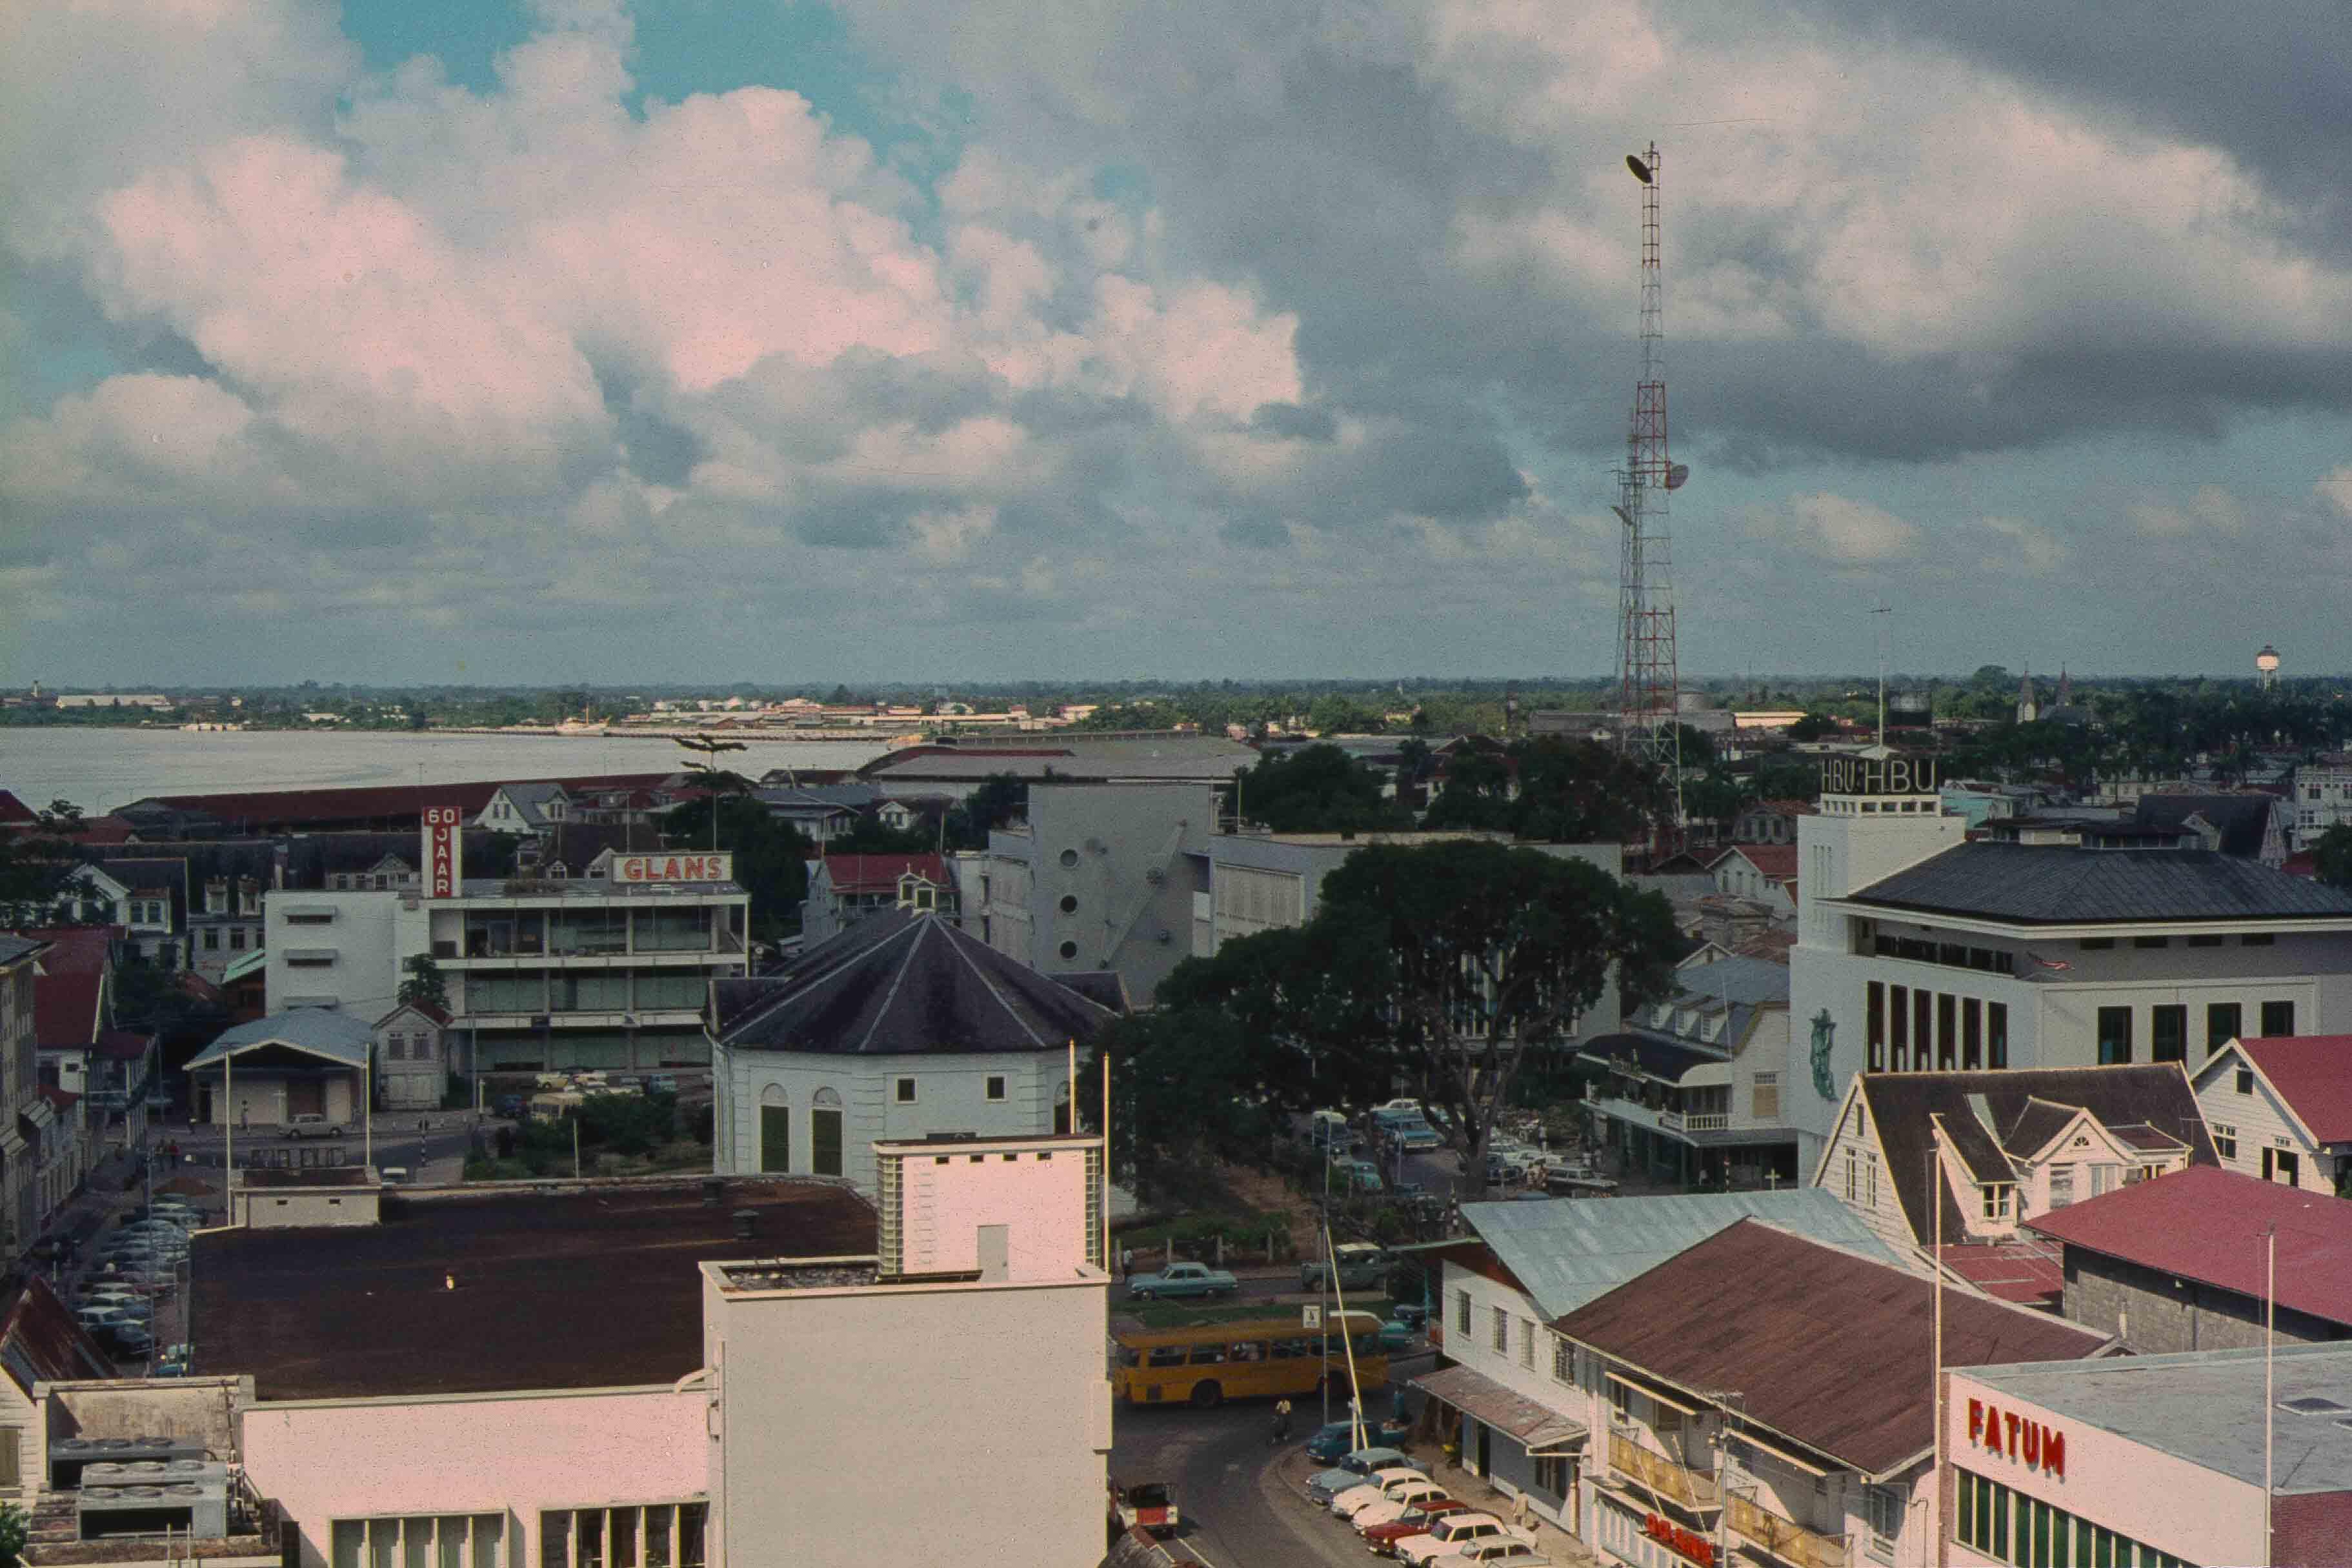 144. Suriname